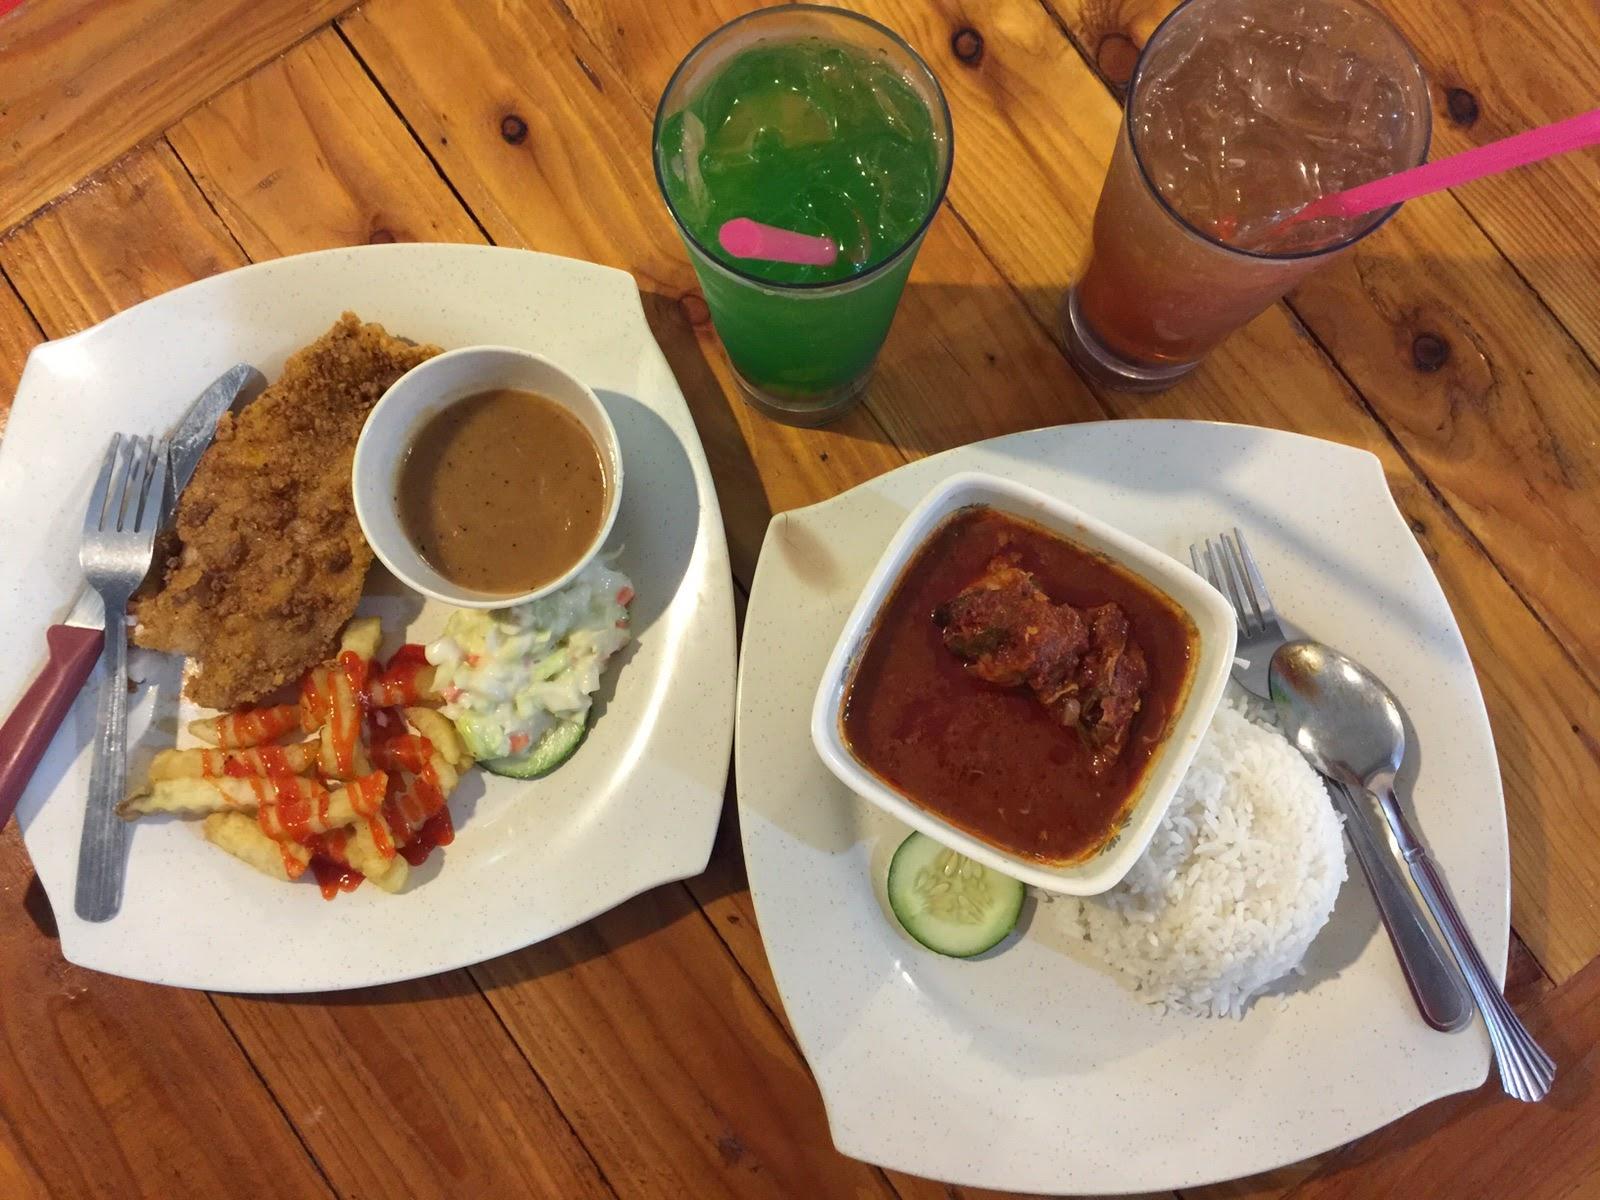 Ct Village Cafe Tempat Makan Sedap Di Kluang Cerita Budak Sepet